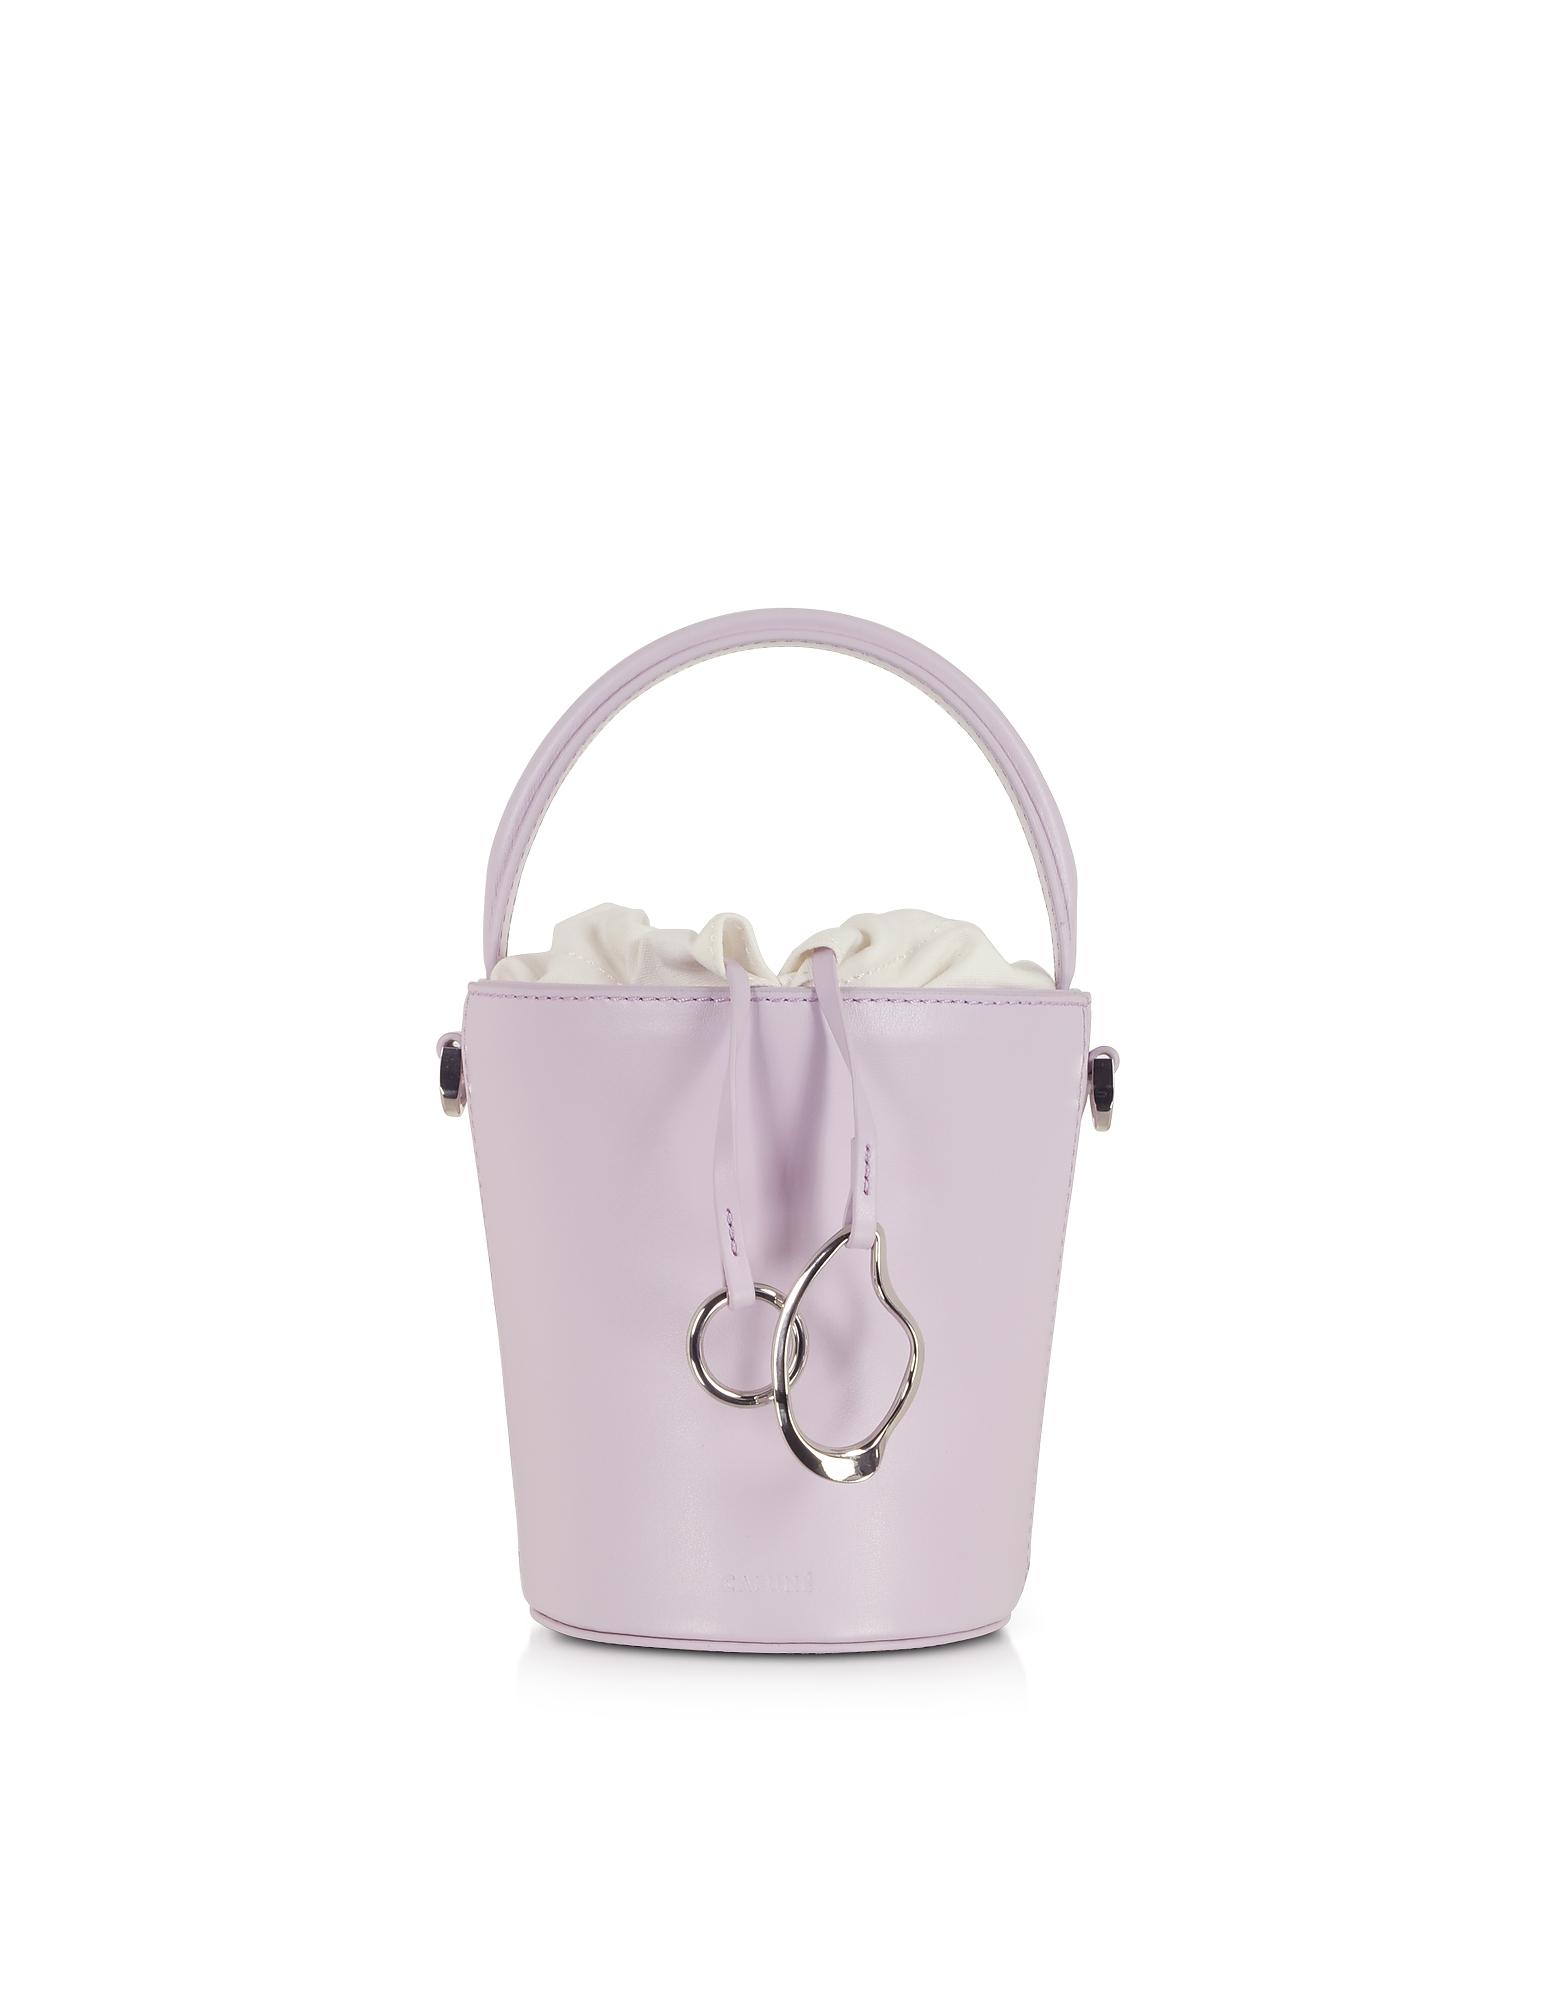 Cafuné Designer Handbags, Lilac Leather Mini Bucket Bag